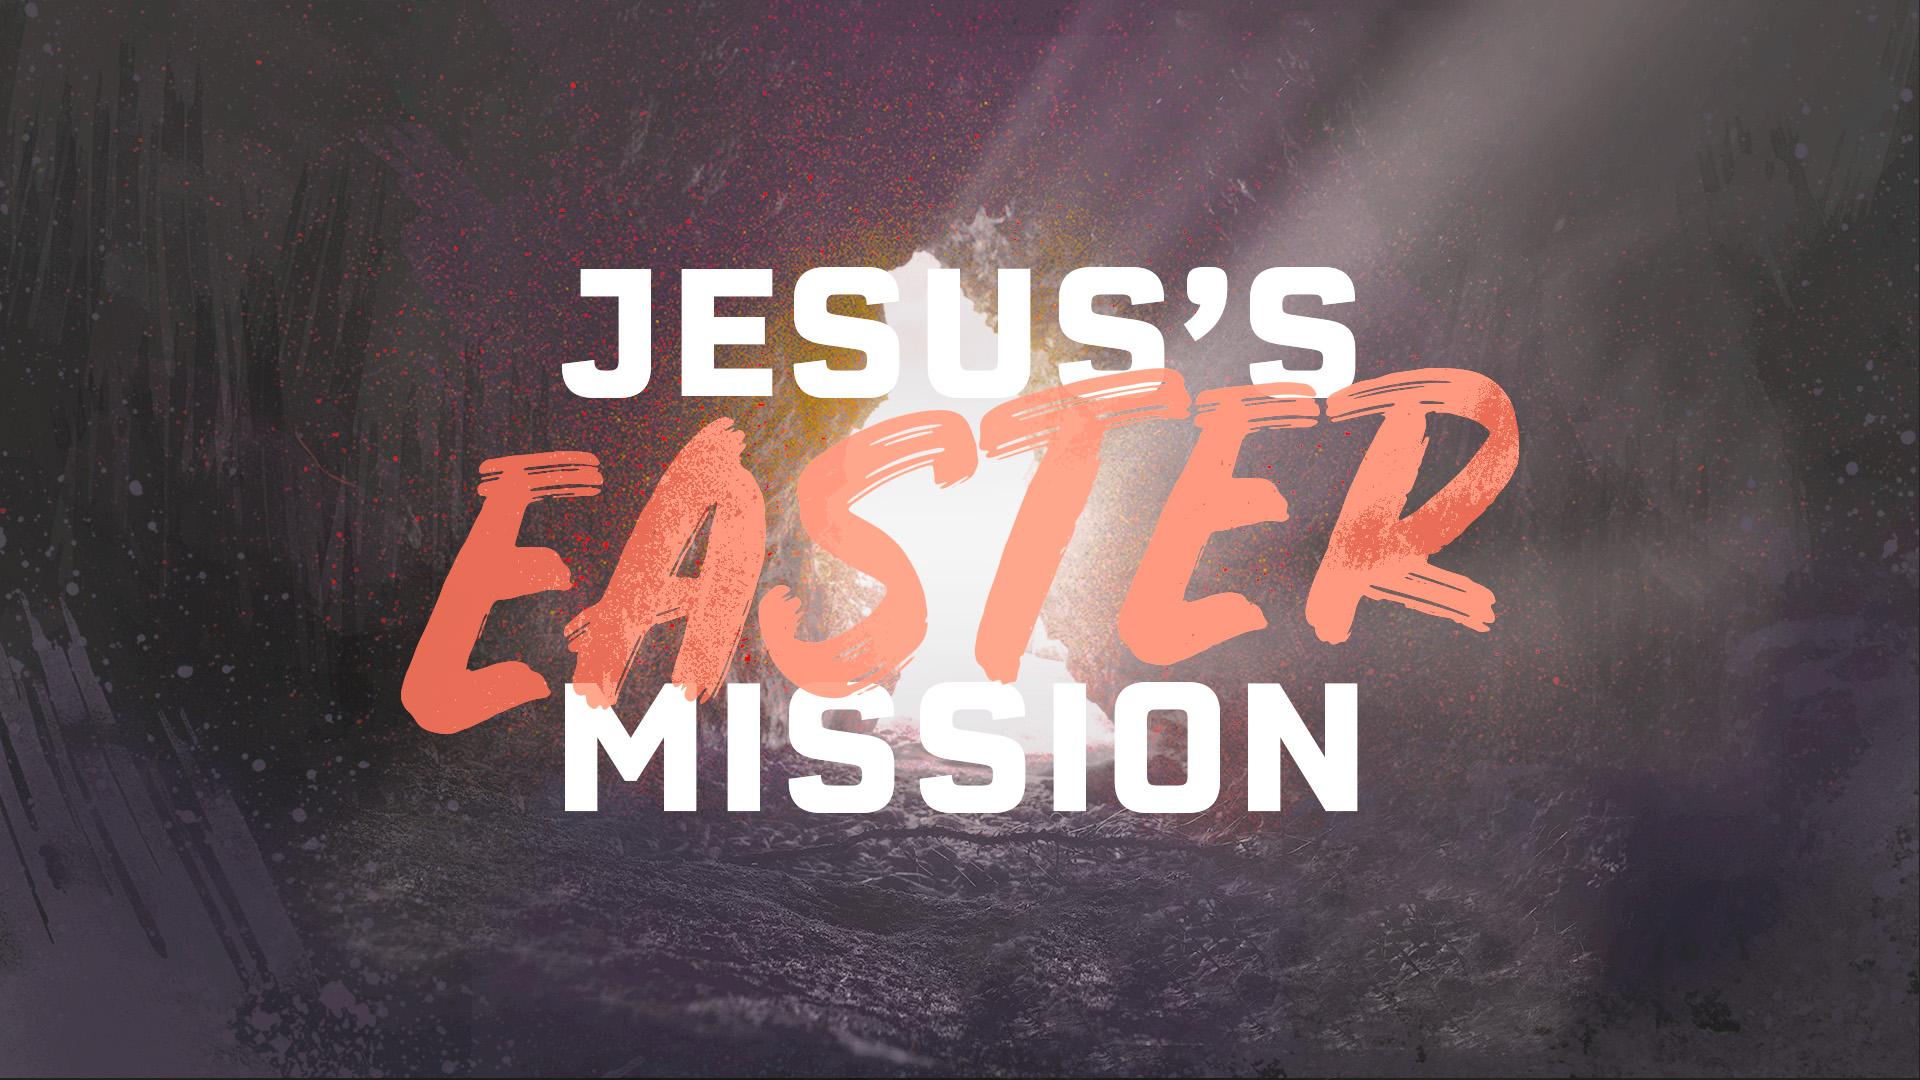 Your Resurrection